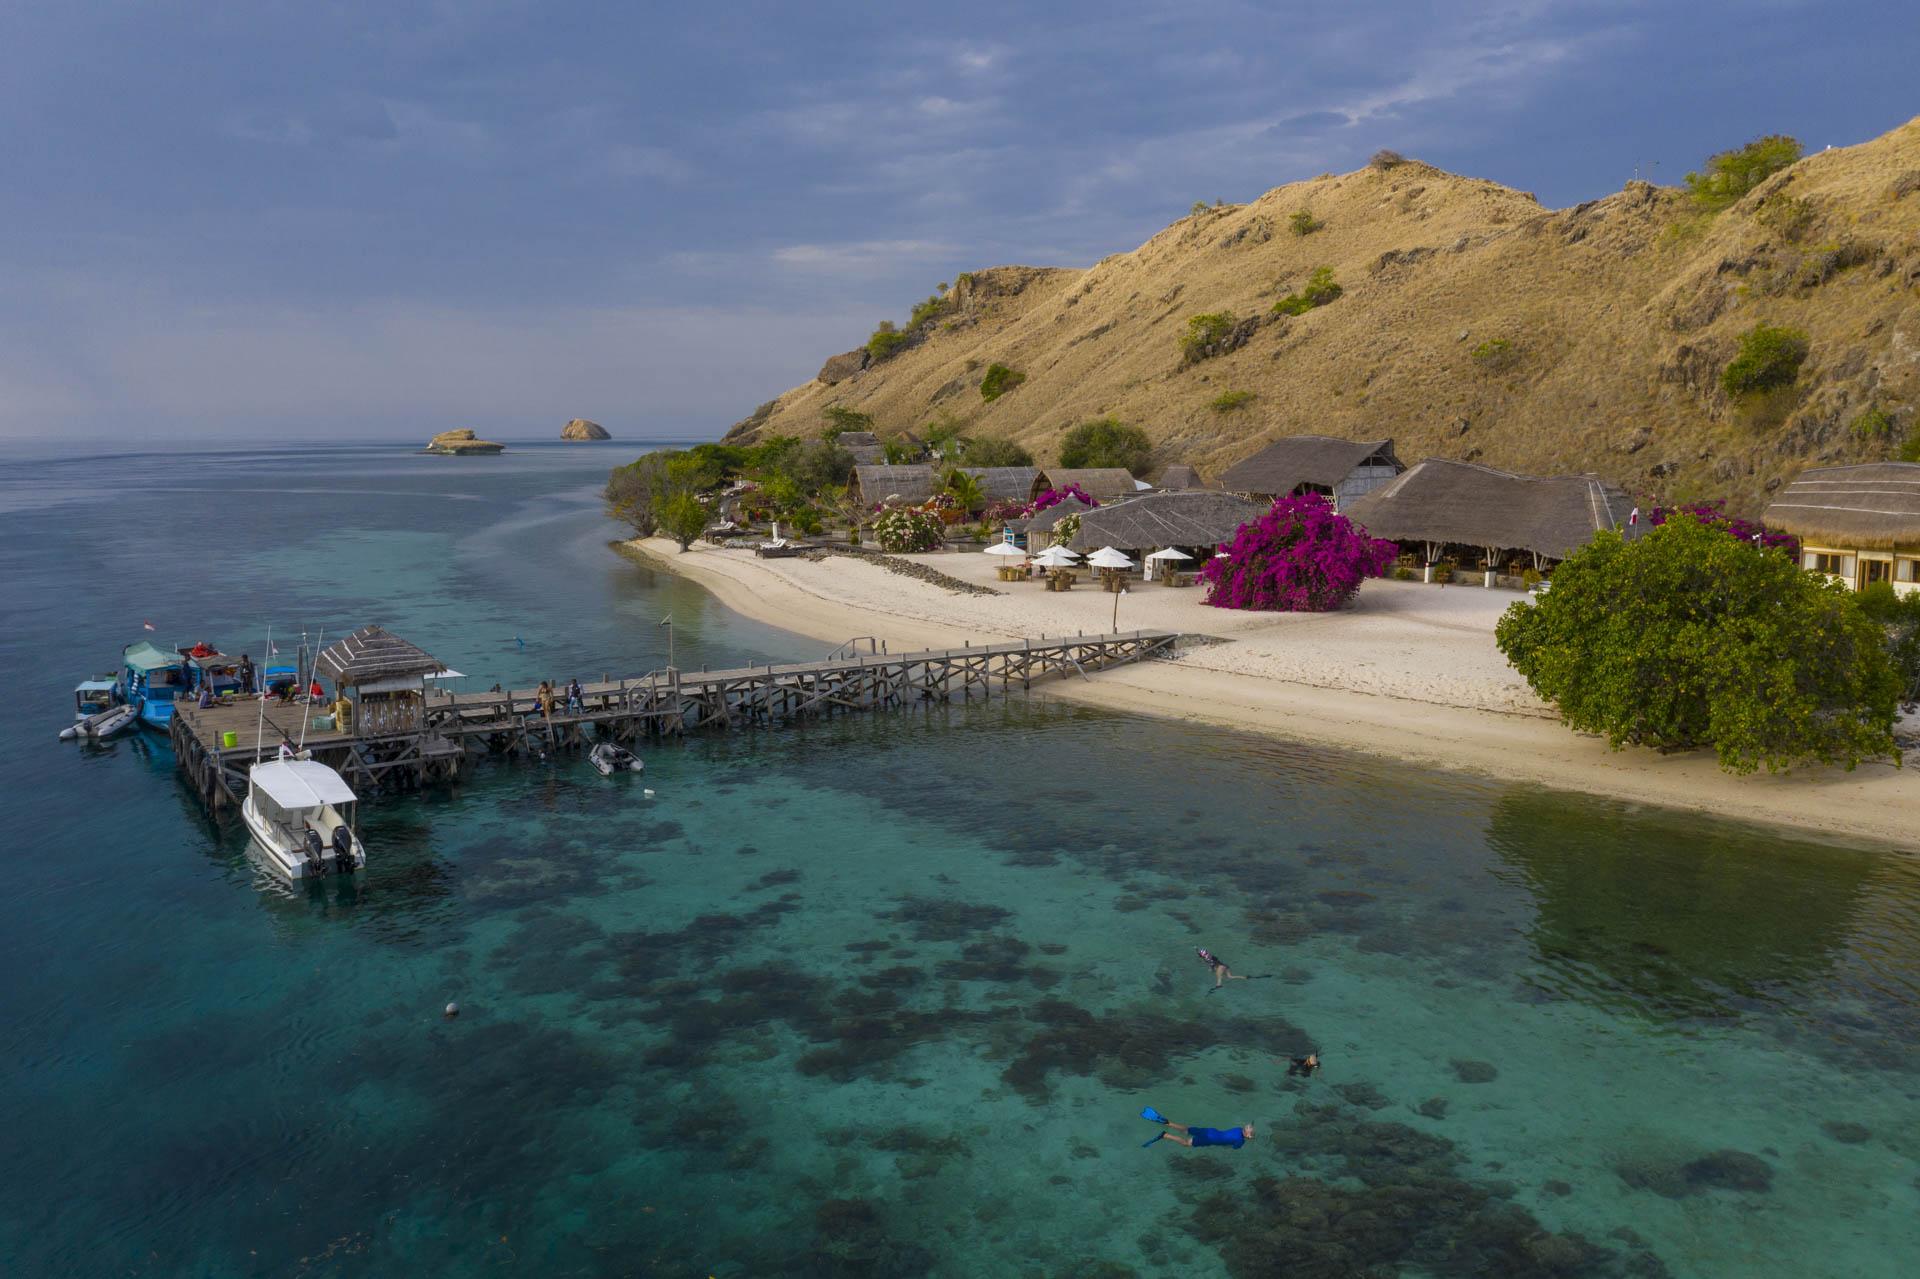 house reef and pier at komodo resort